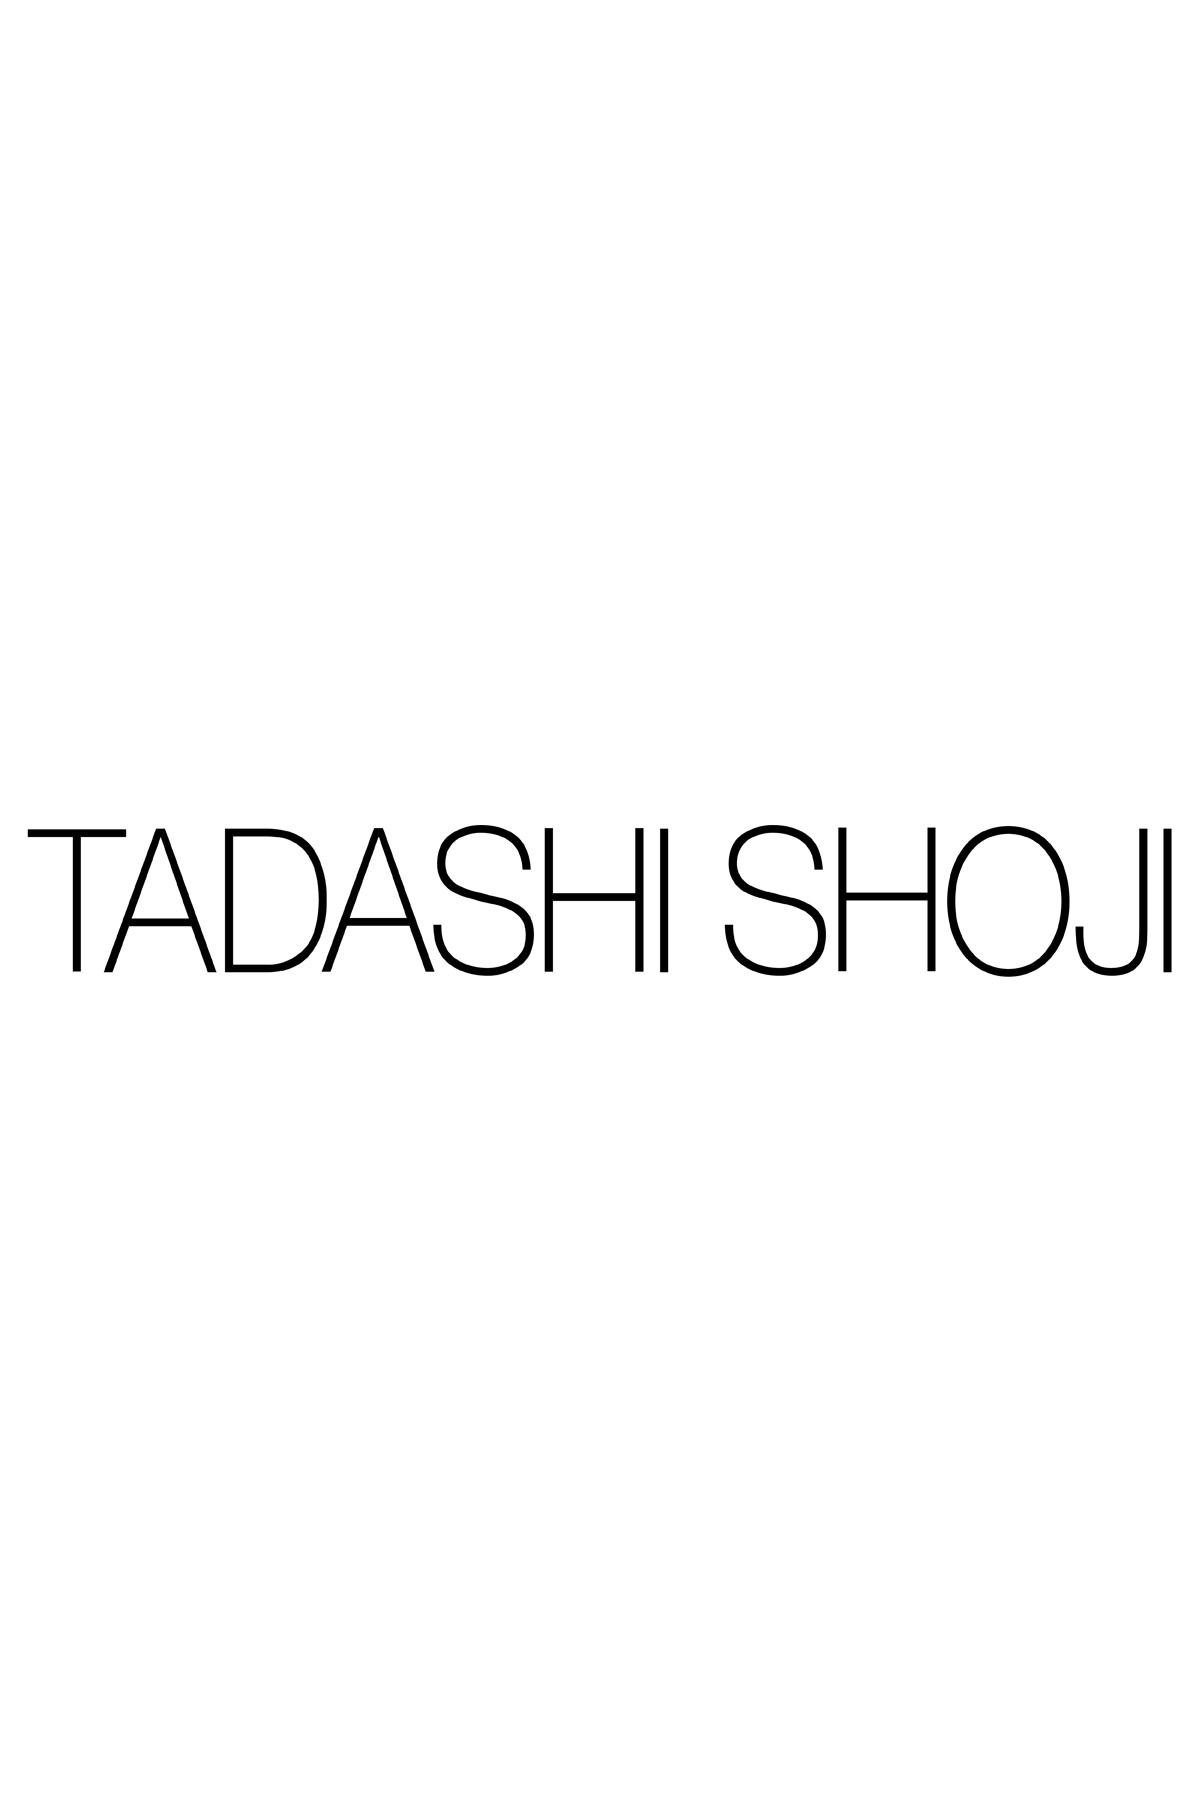 Tadashi Shoji - Yew Embroidered Dress - PLUS SIZE